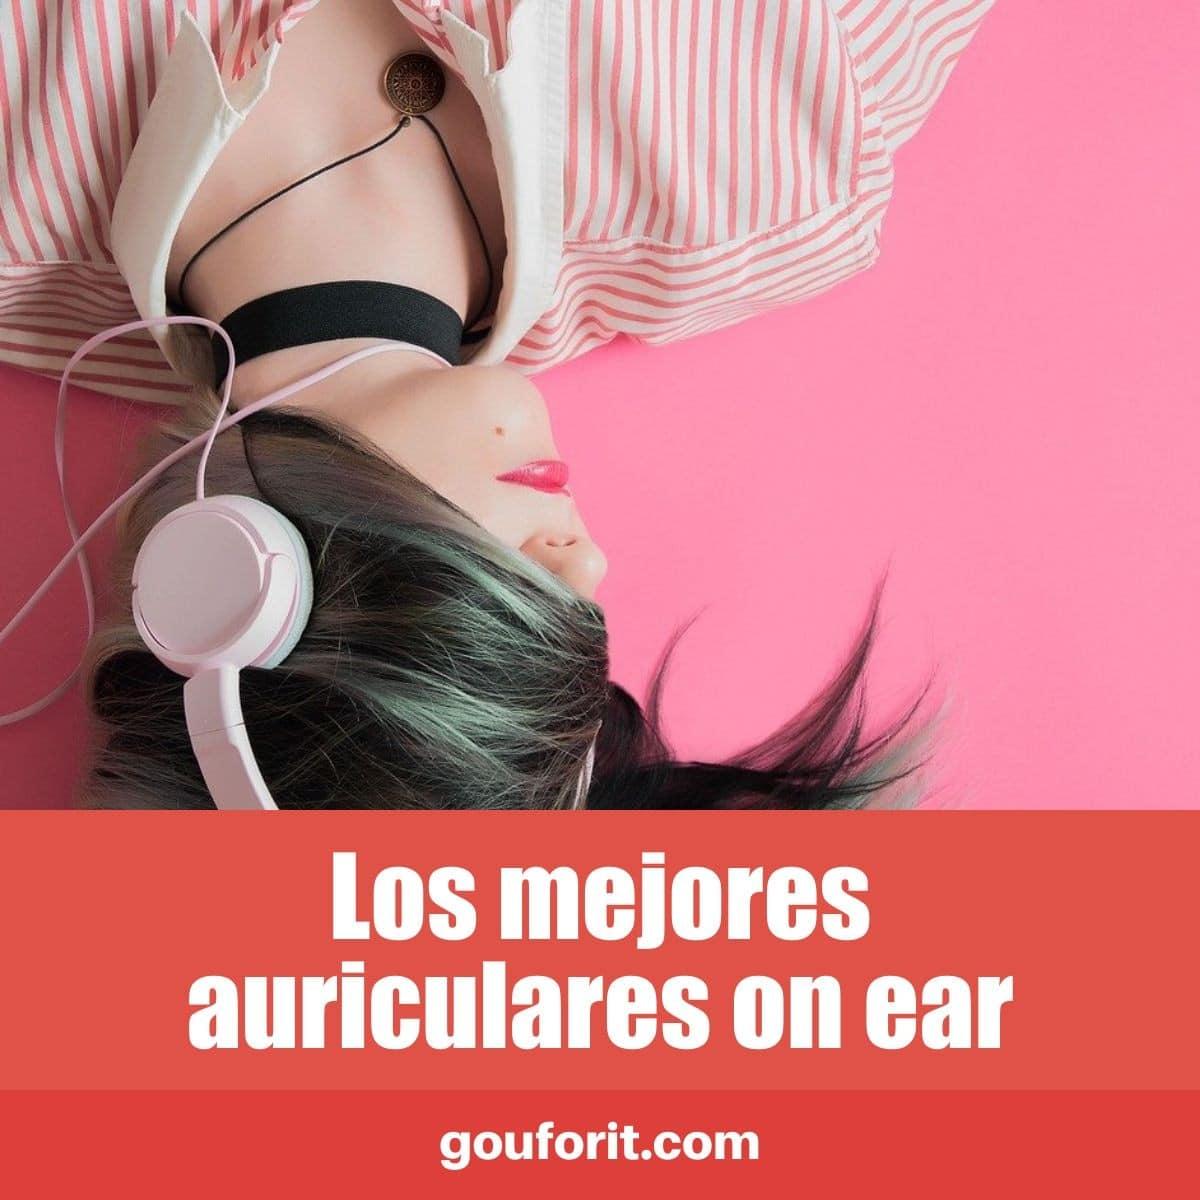 Los mejores auriculares on ear